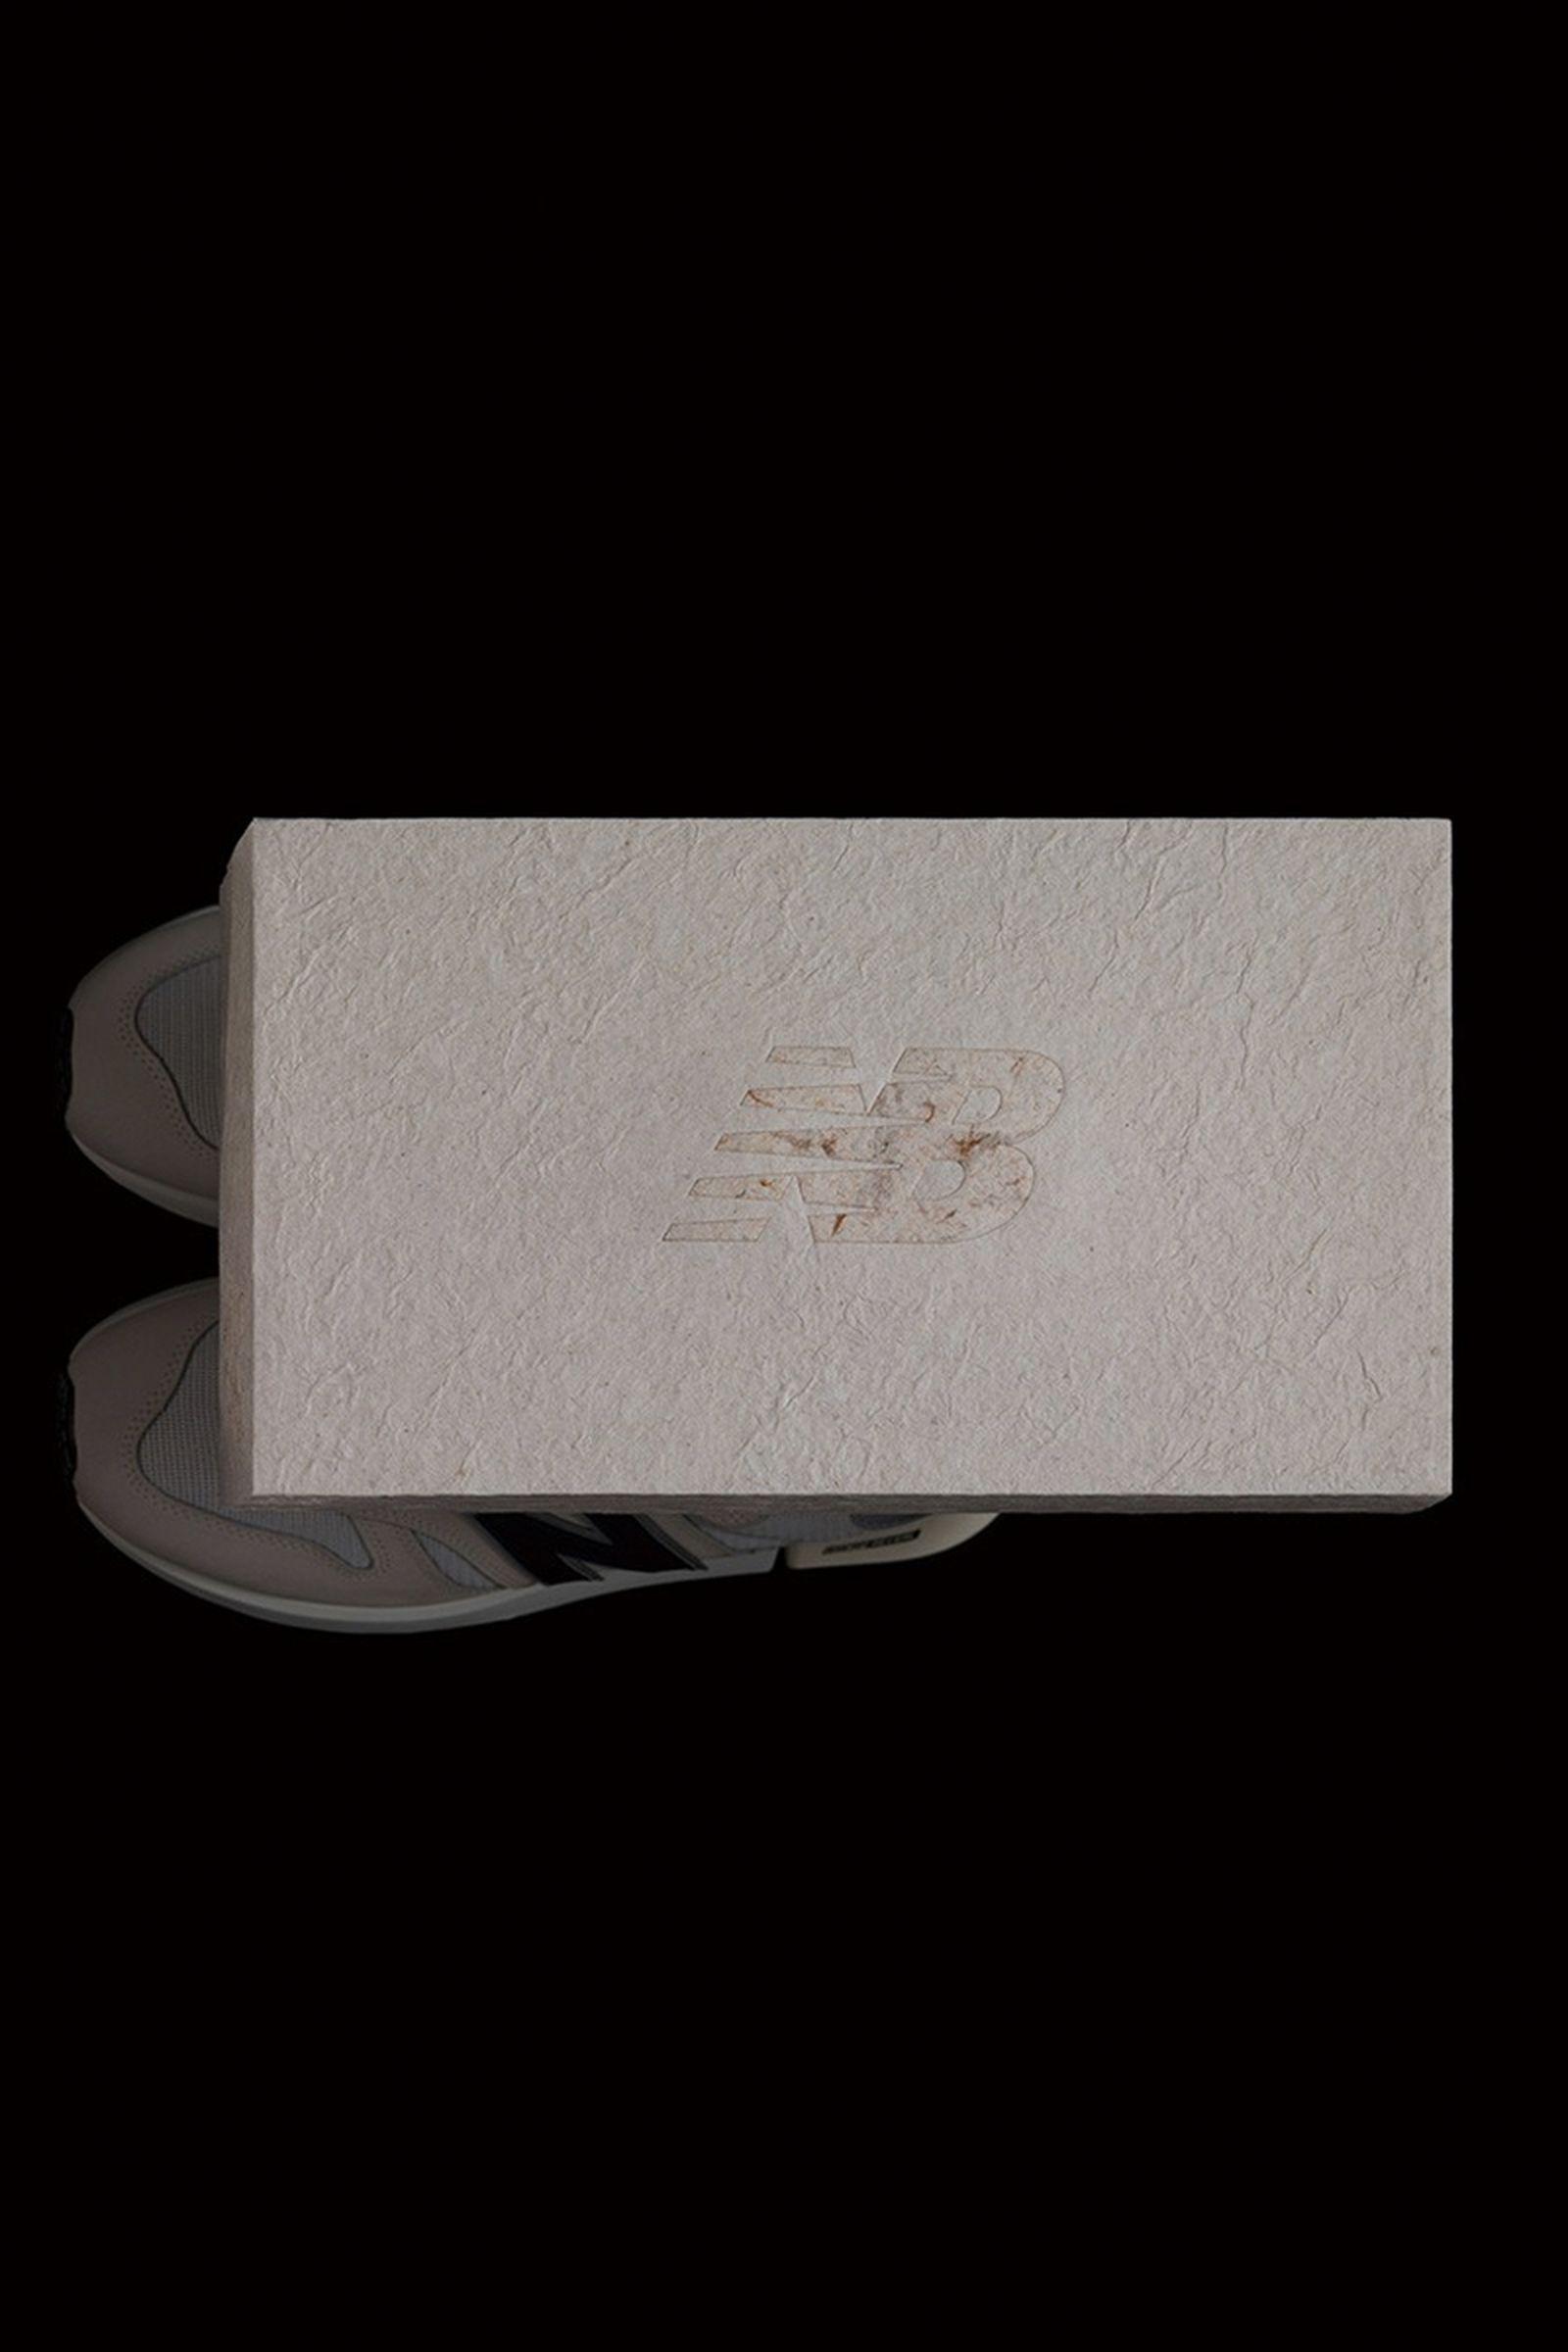 yoshihisa-tanaka-new-balance-shoebox-04